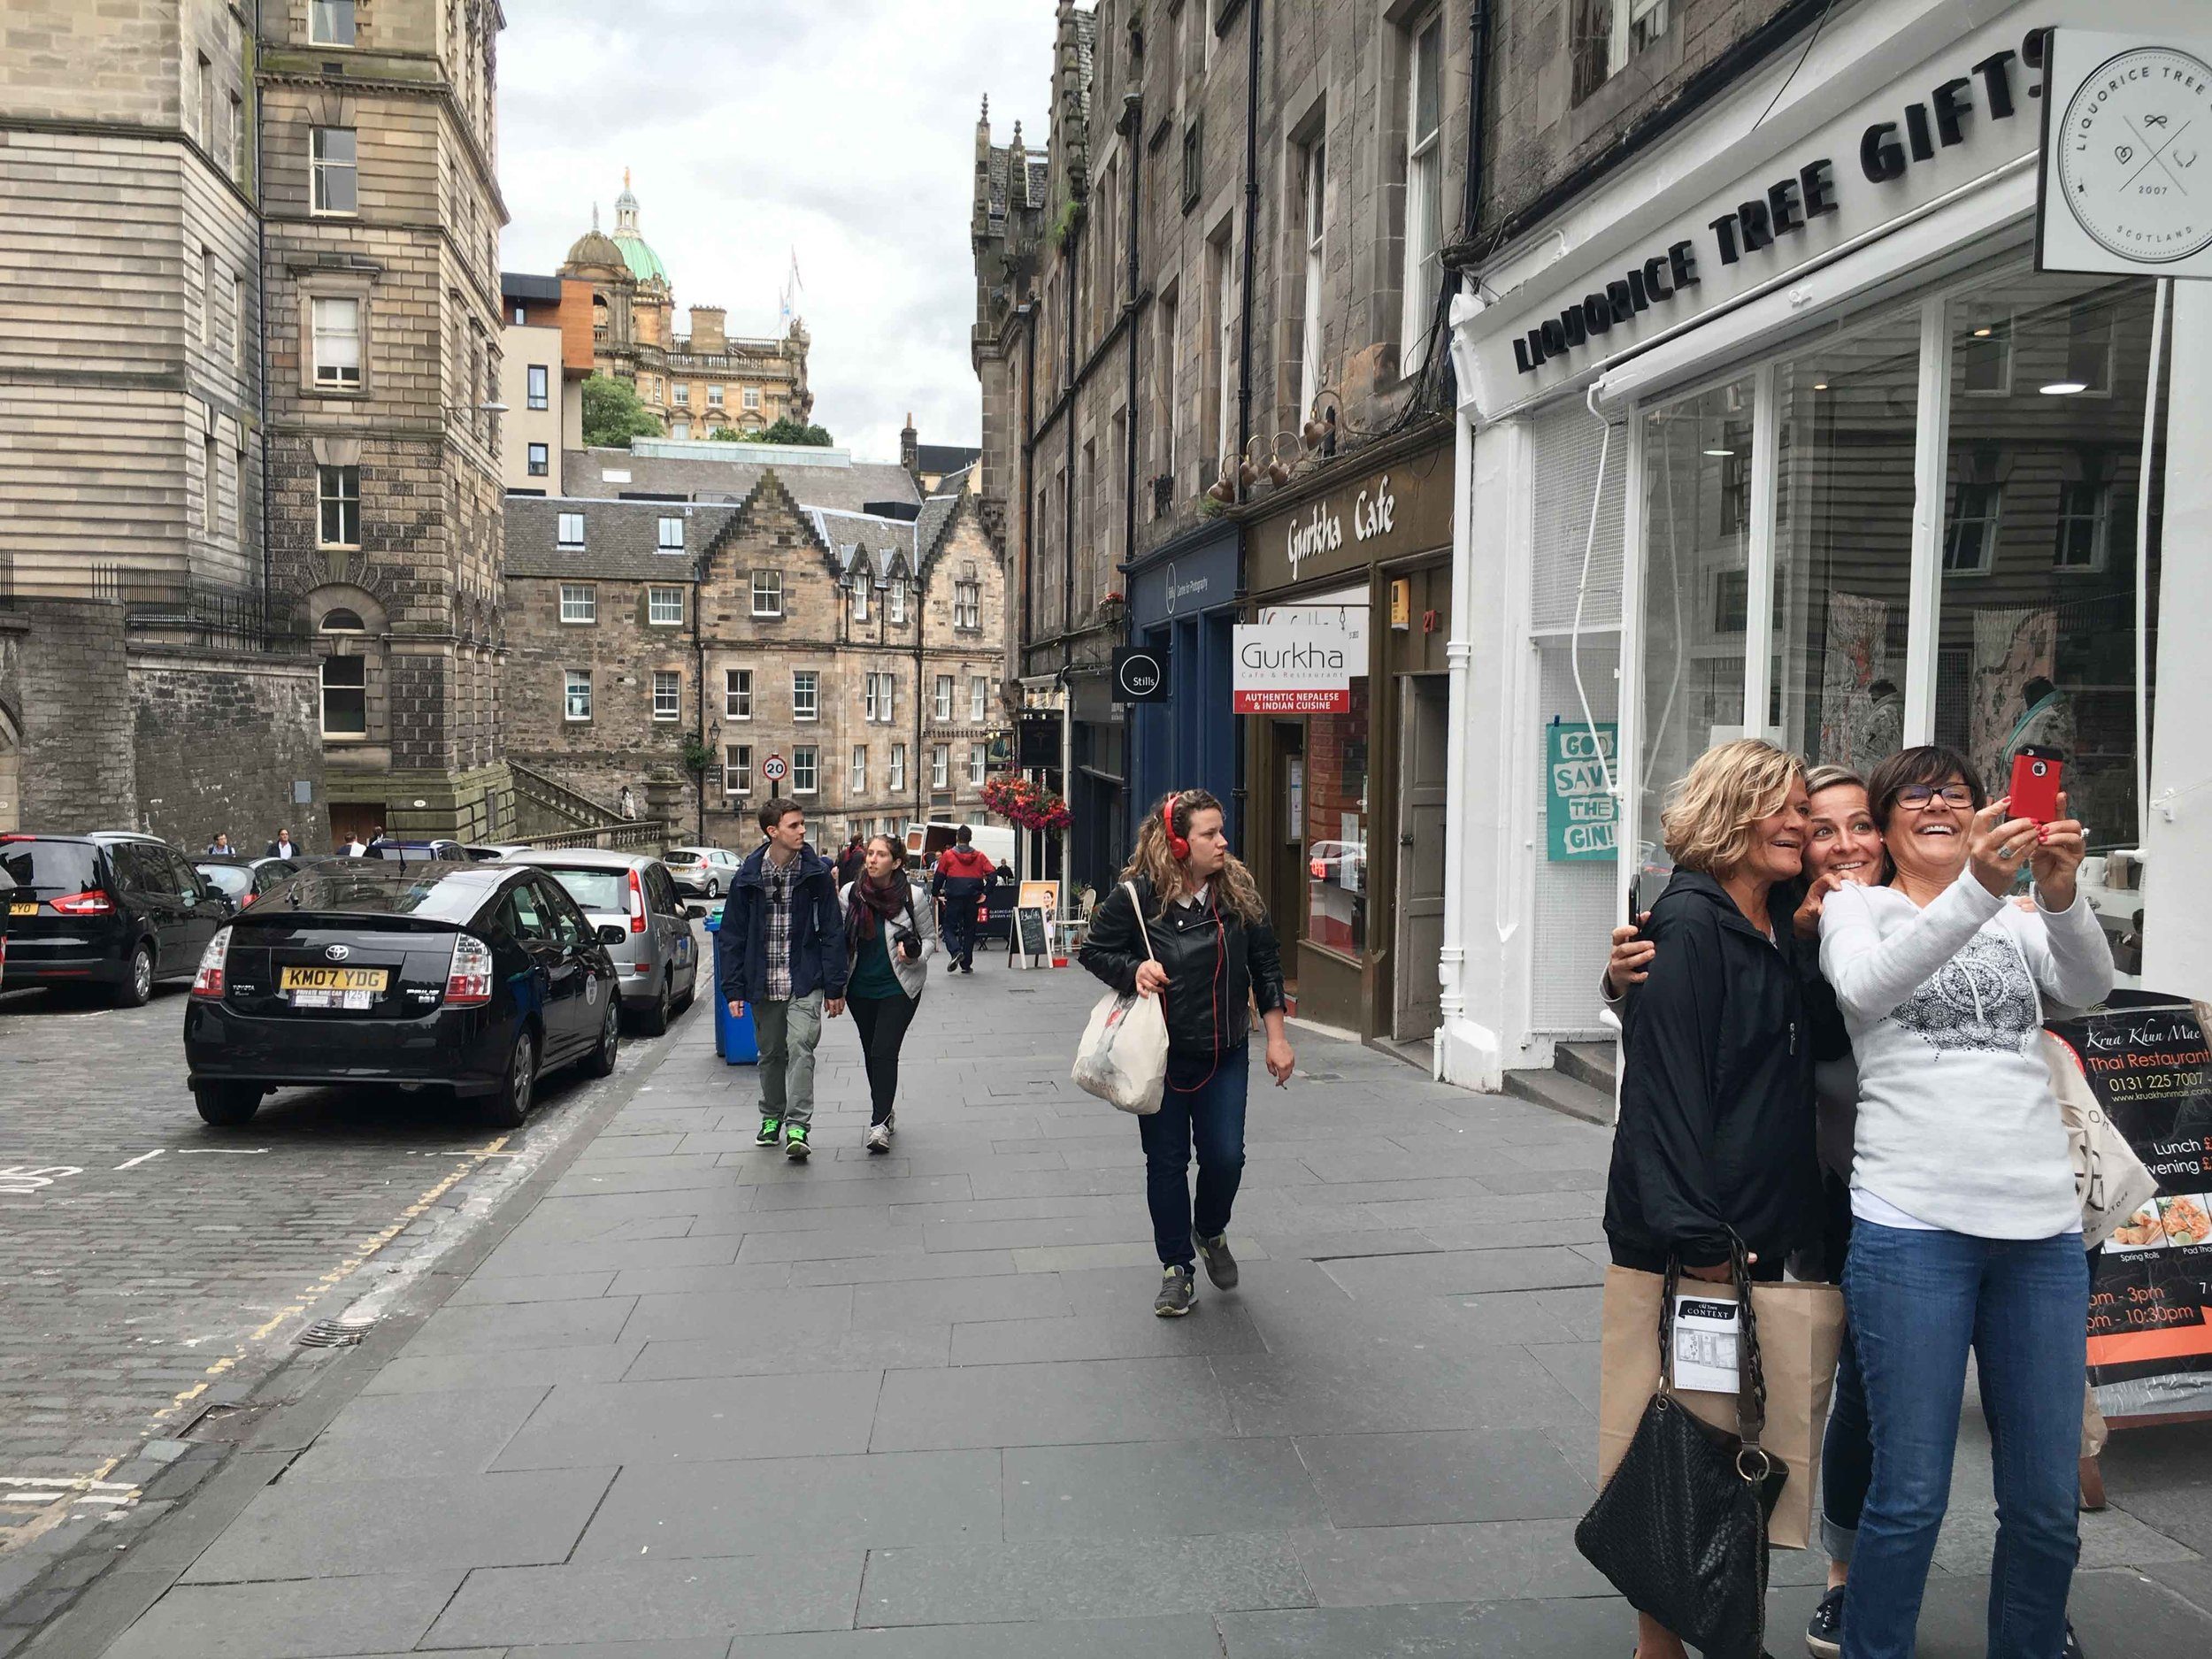 Royal Mile, Edinburgh, Scotland. Image©thingstodot.com